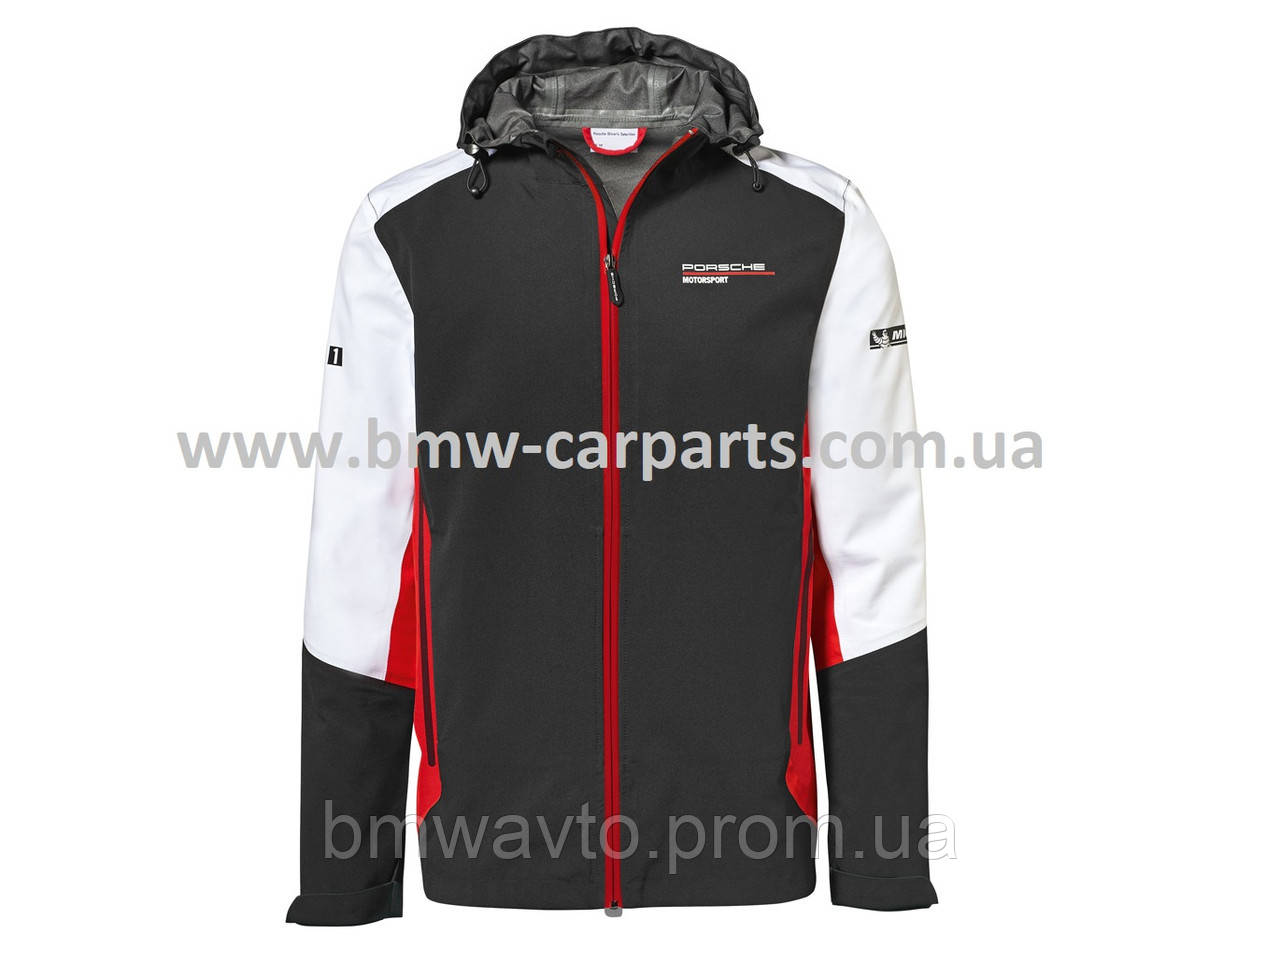 Ветровка унисекс Porsche Unisex Windbreaker Jacket, Motorsport